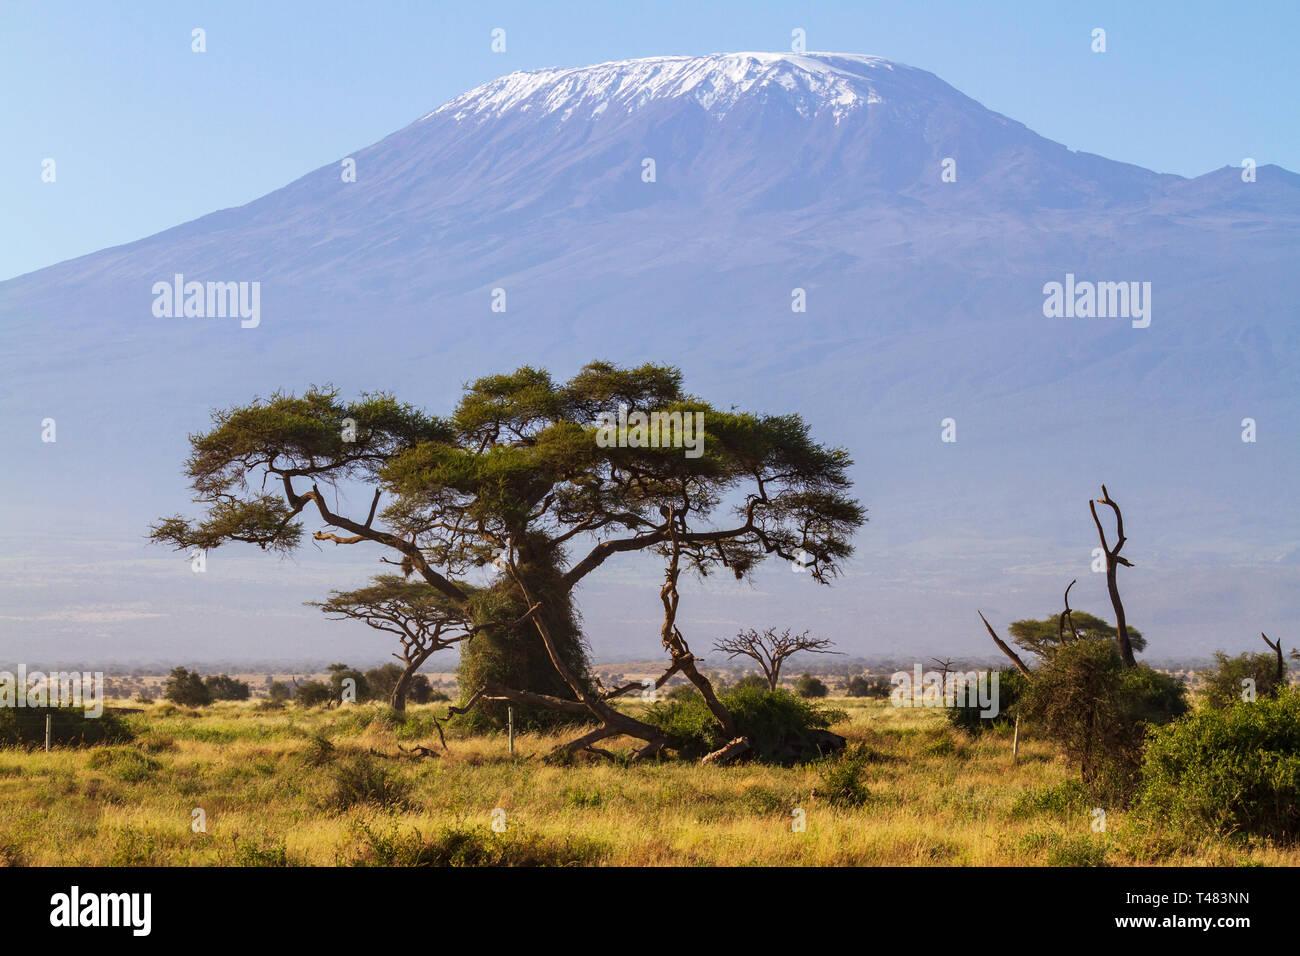 Landscape view Mount Kilimanjaro copy space Amboseli Kenya safari East Africa - Stock Image